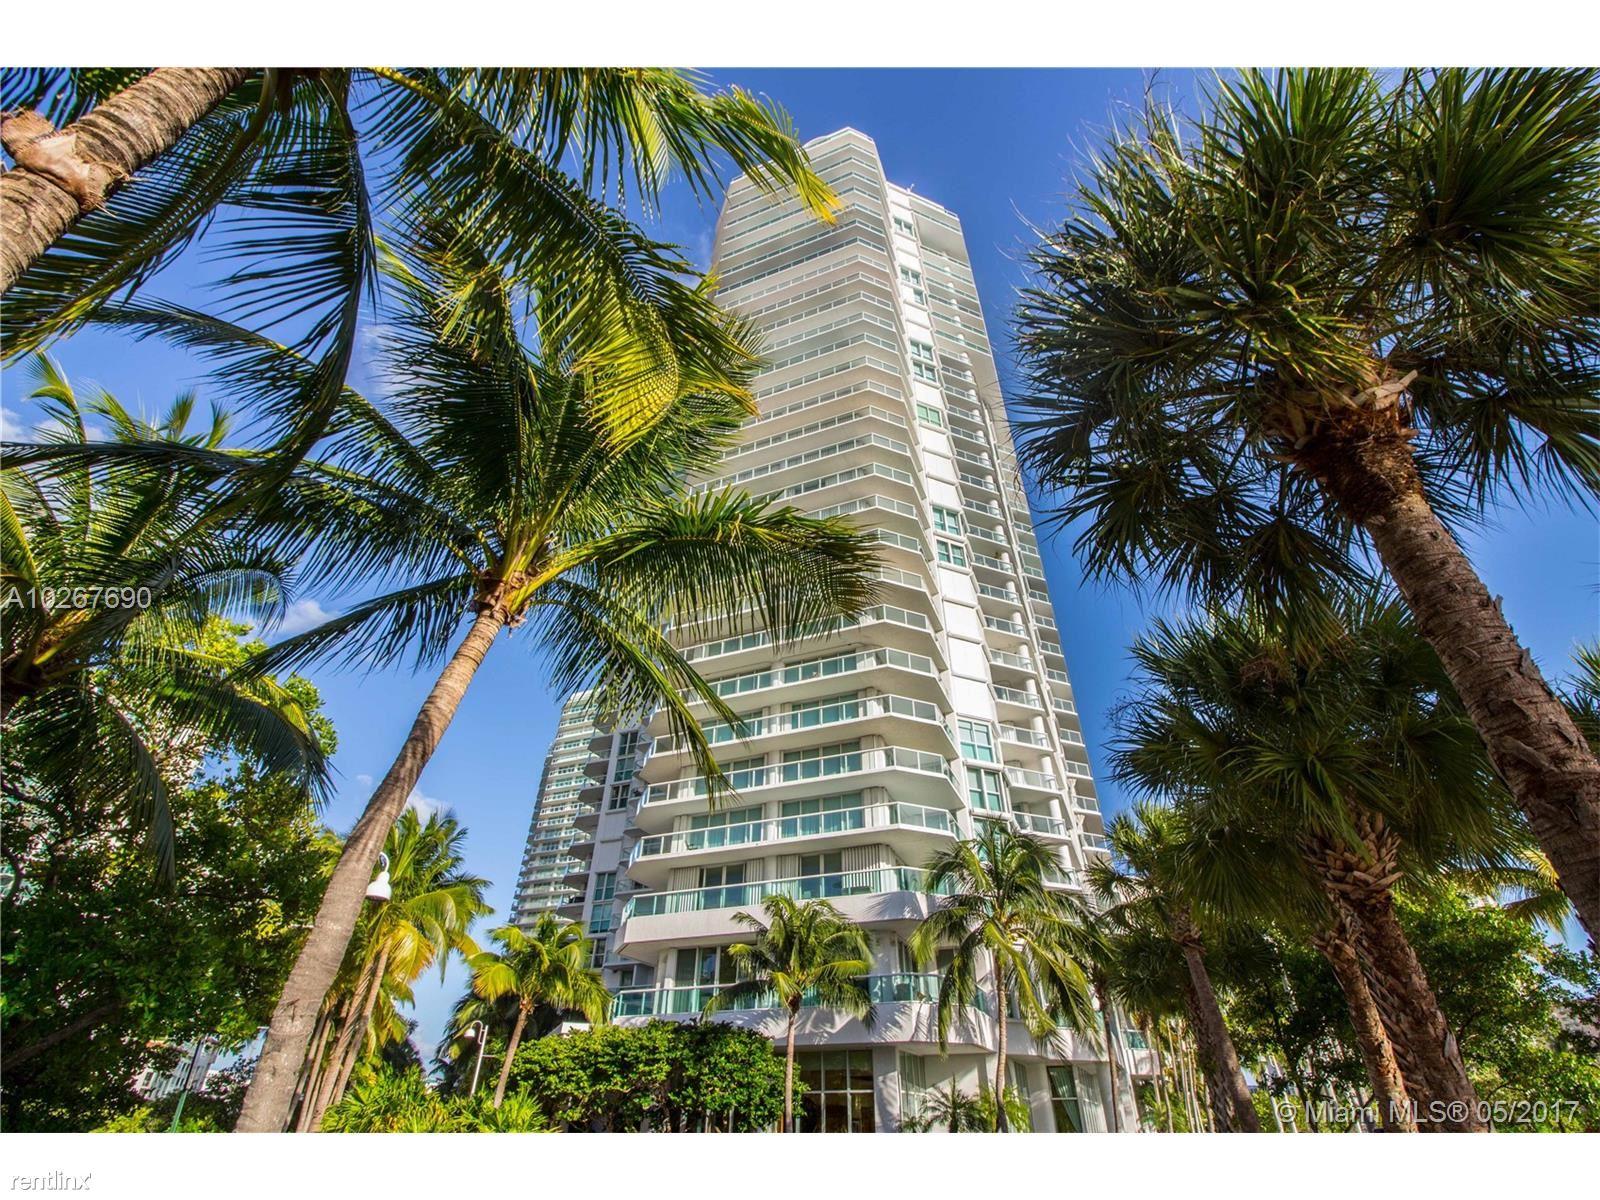 16500 Collins Ave, Sunny Isles Beach, FL - $3,400